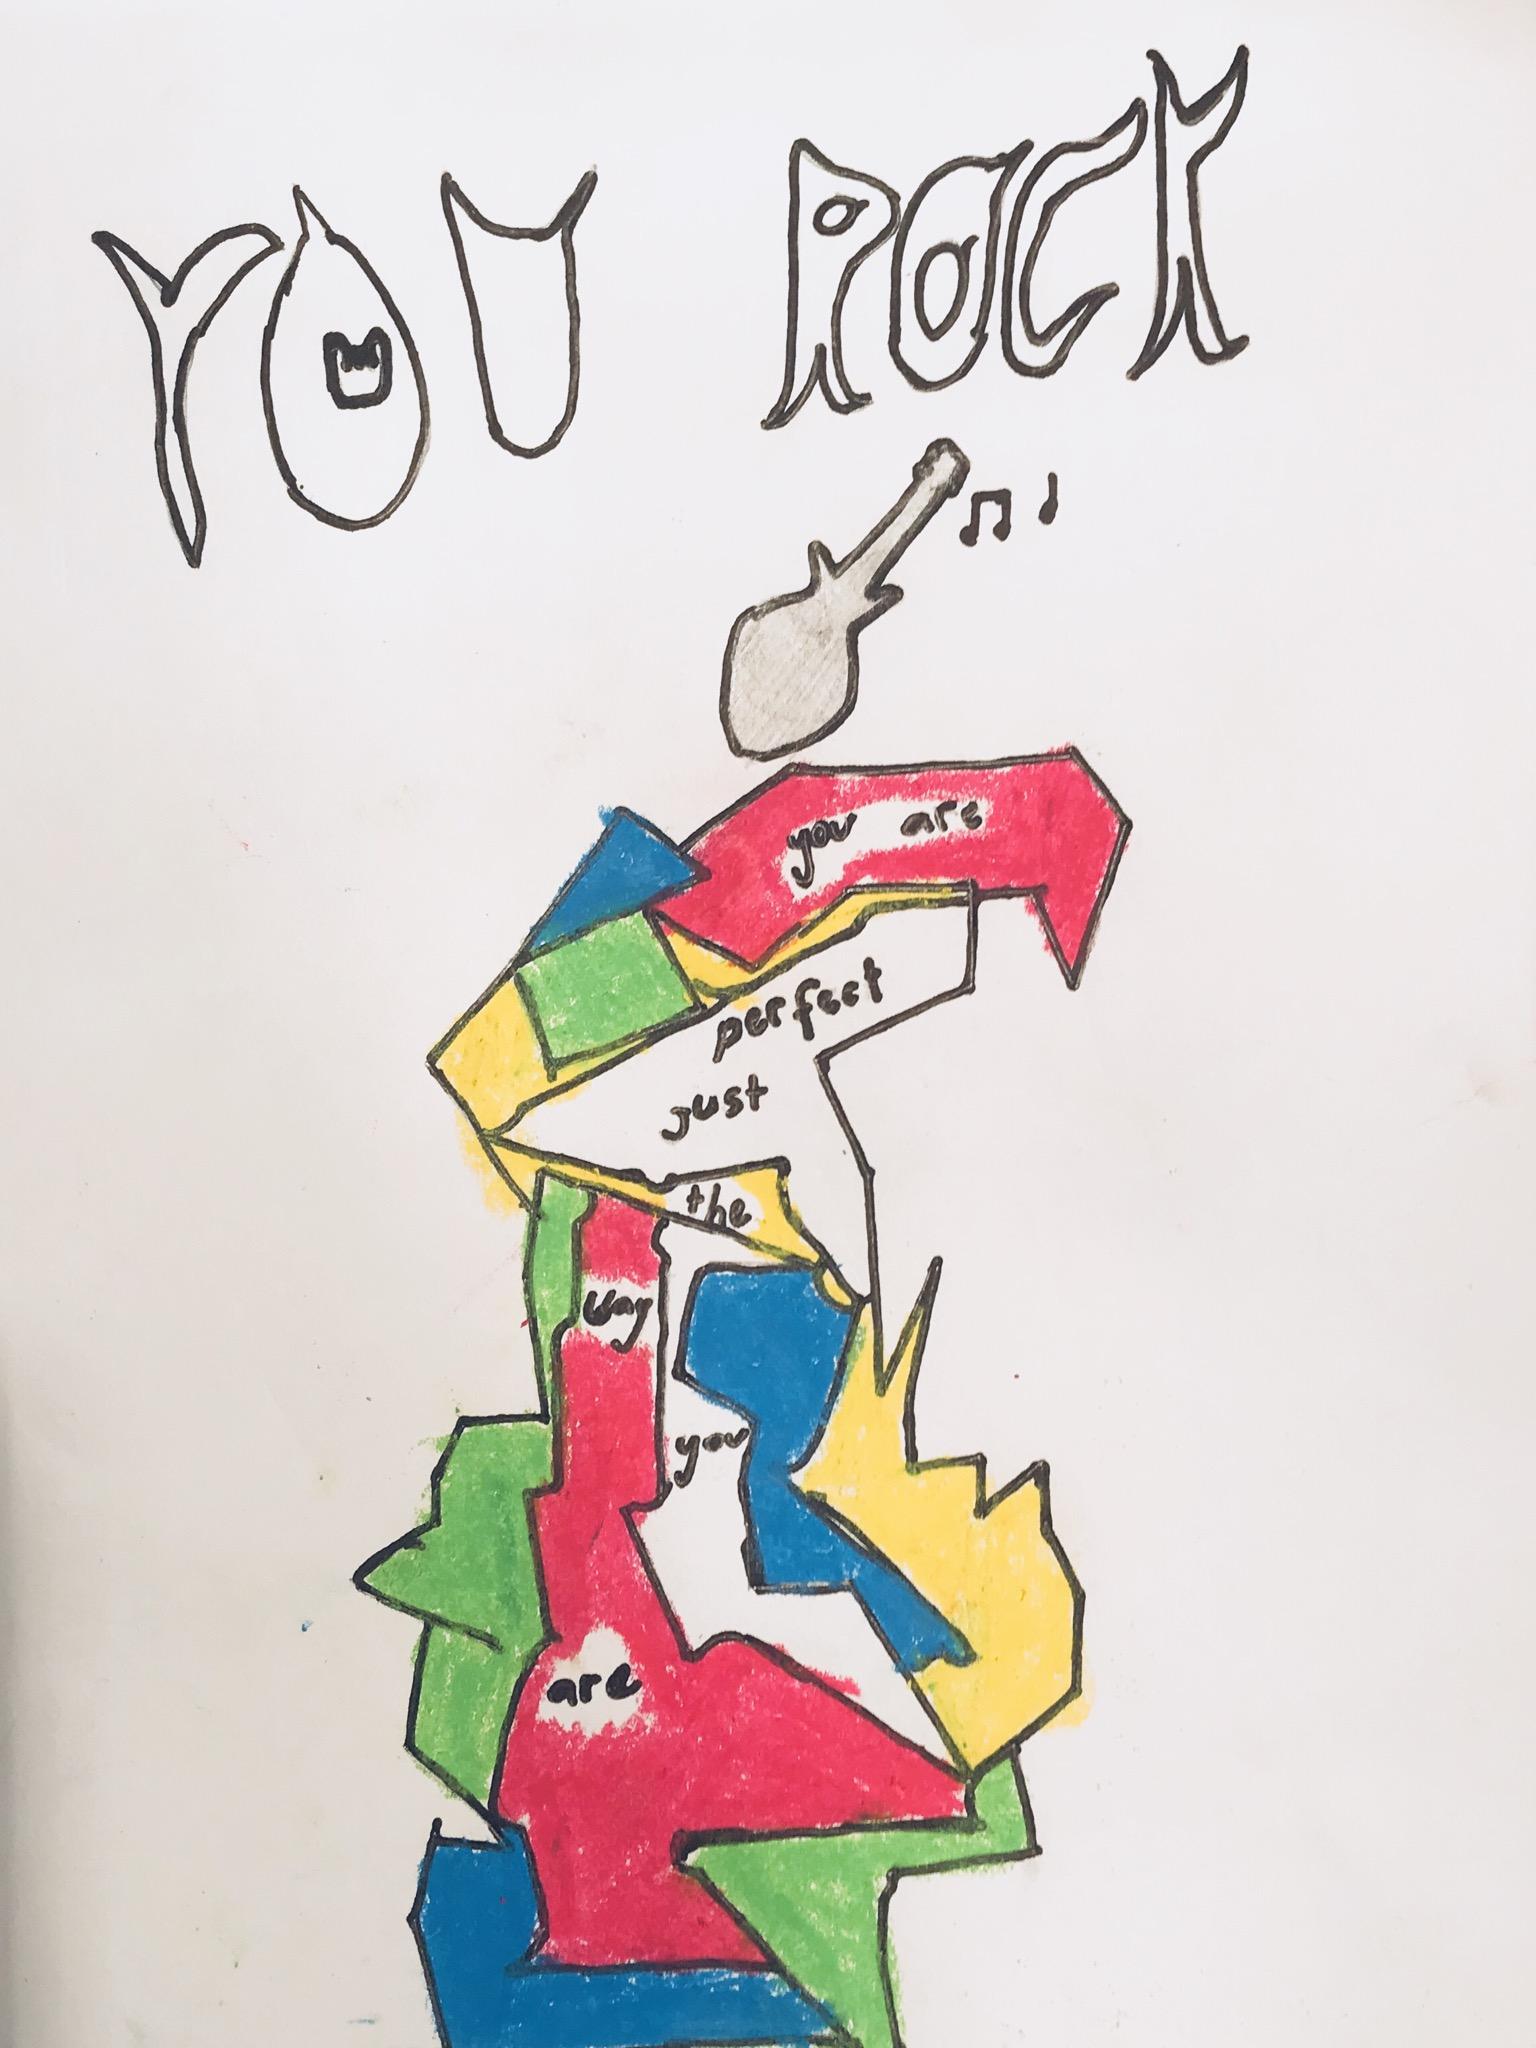 020 - YOU ROCK by Lydia Jeremijenko (age 9) in Gold Coast, Australia